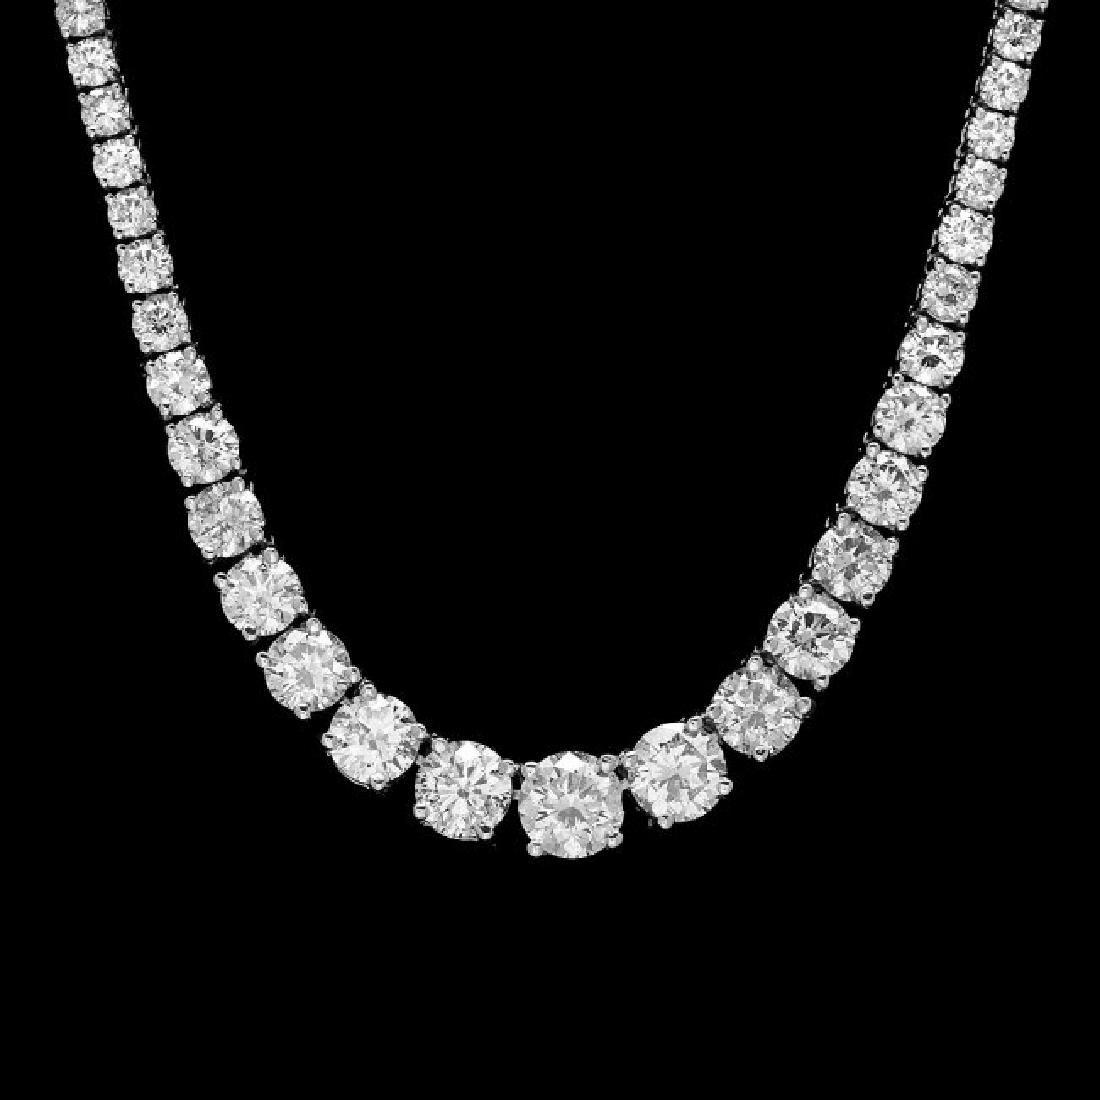 18k White Gold 11.50ct Diamond Necklace